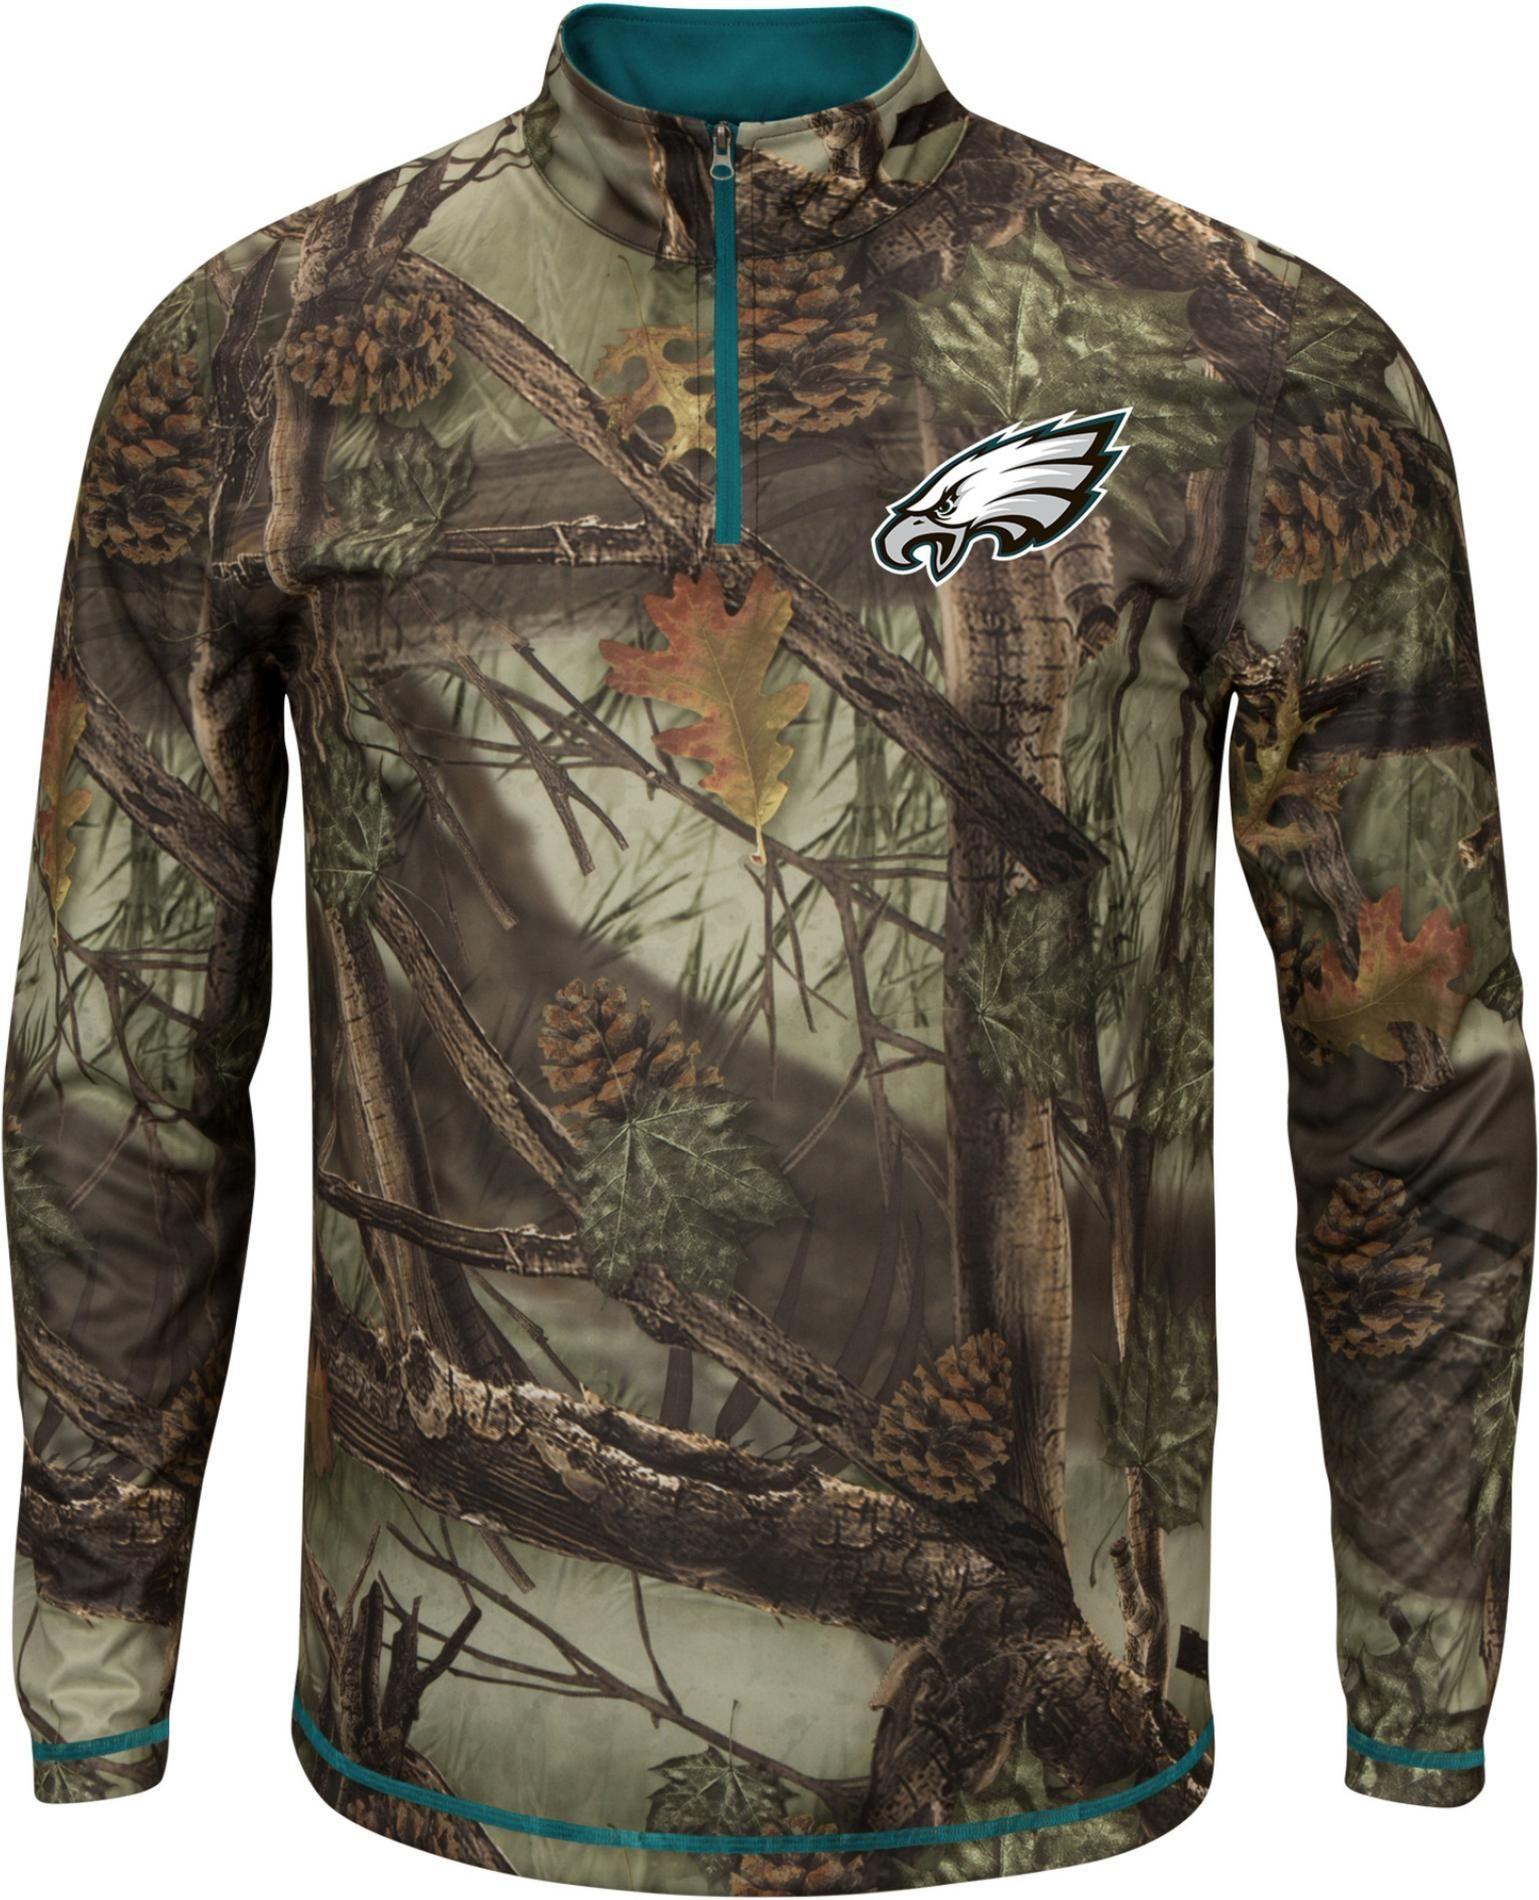 NFL Men s Quarter-Zip Shirt - Philadelphia Eagles  1032d017d